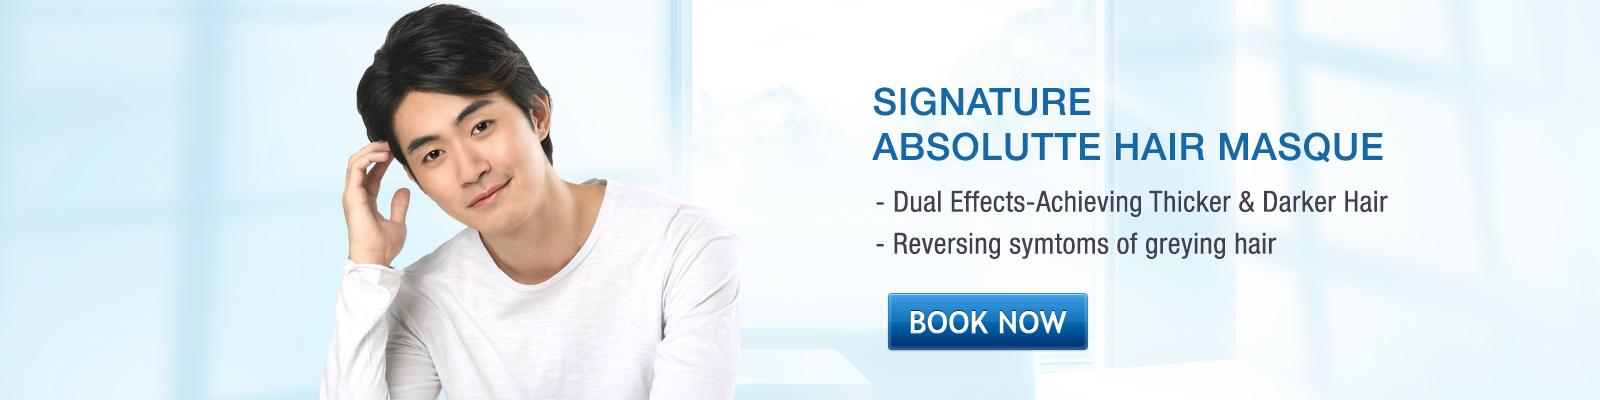 Signature Absolutte Hair Masque Treatment